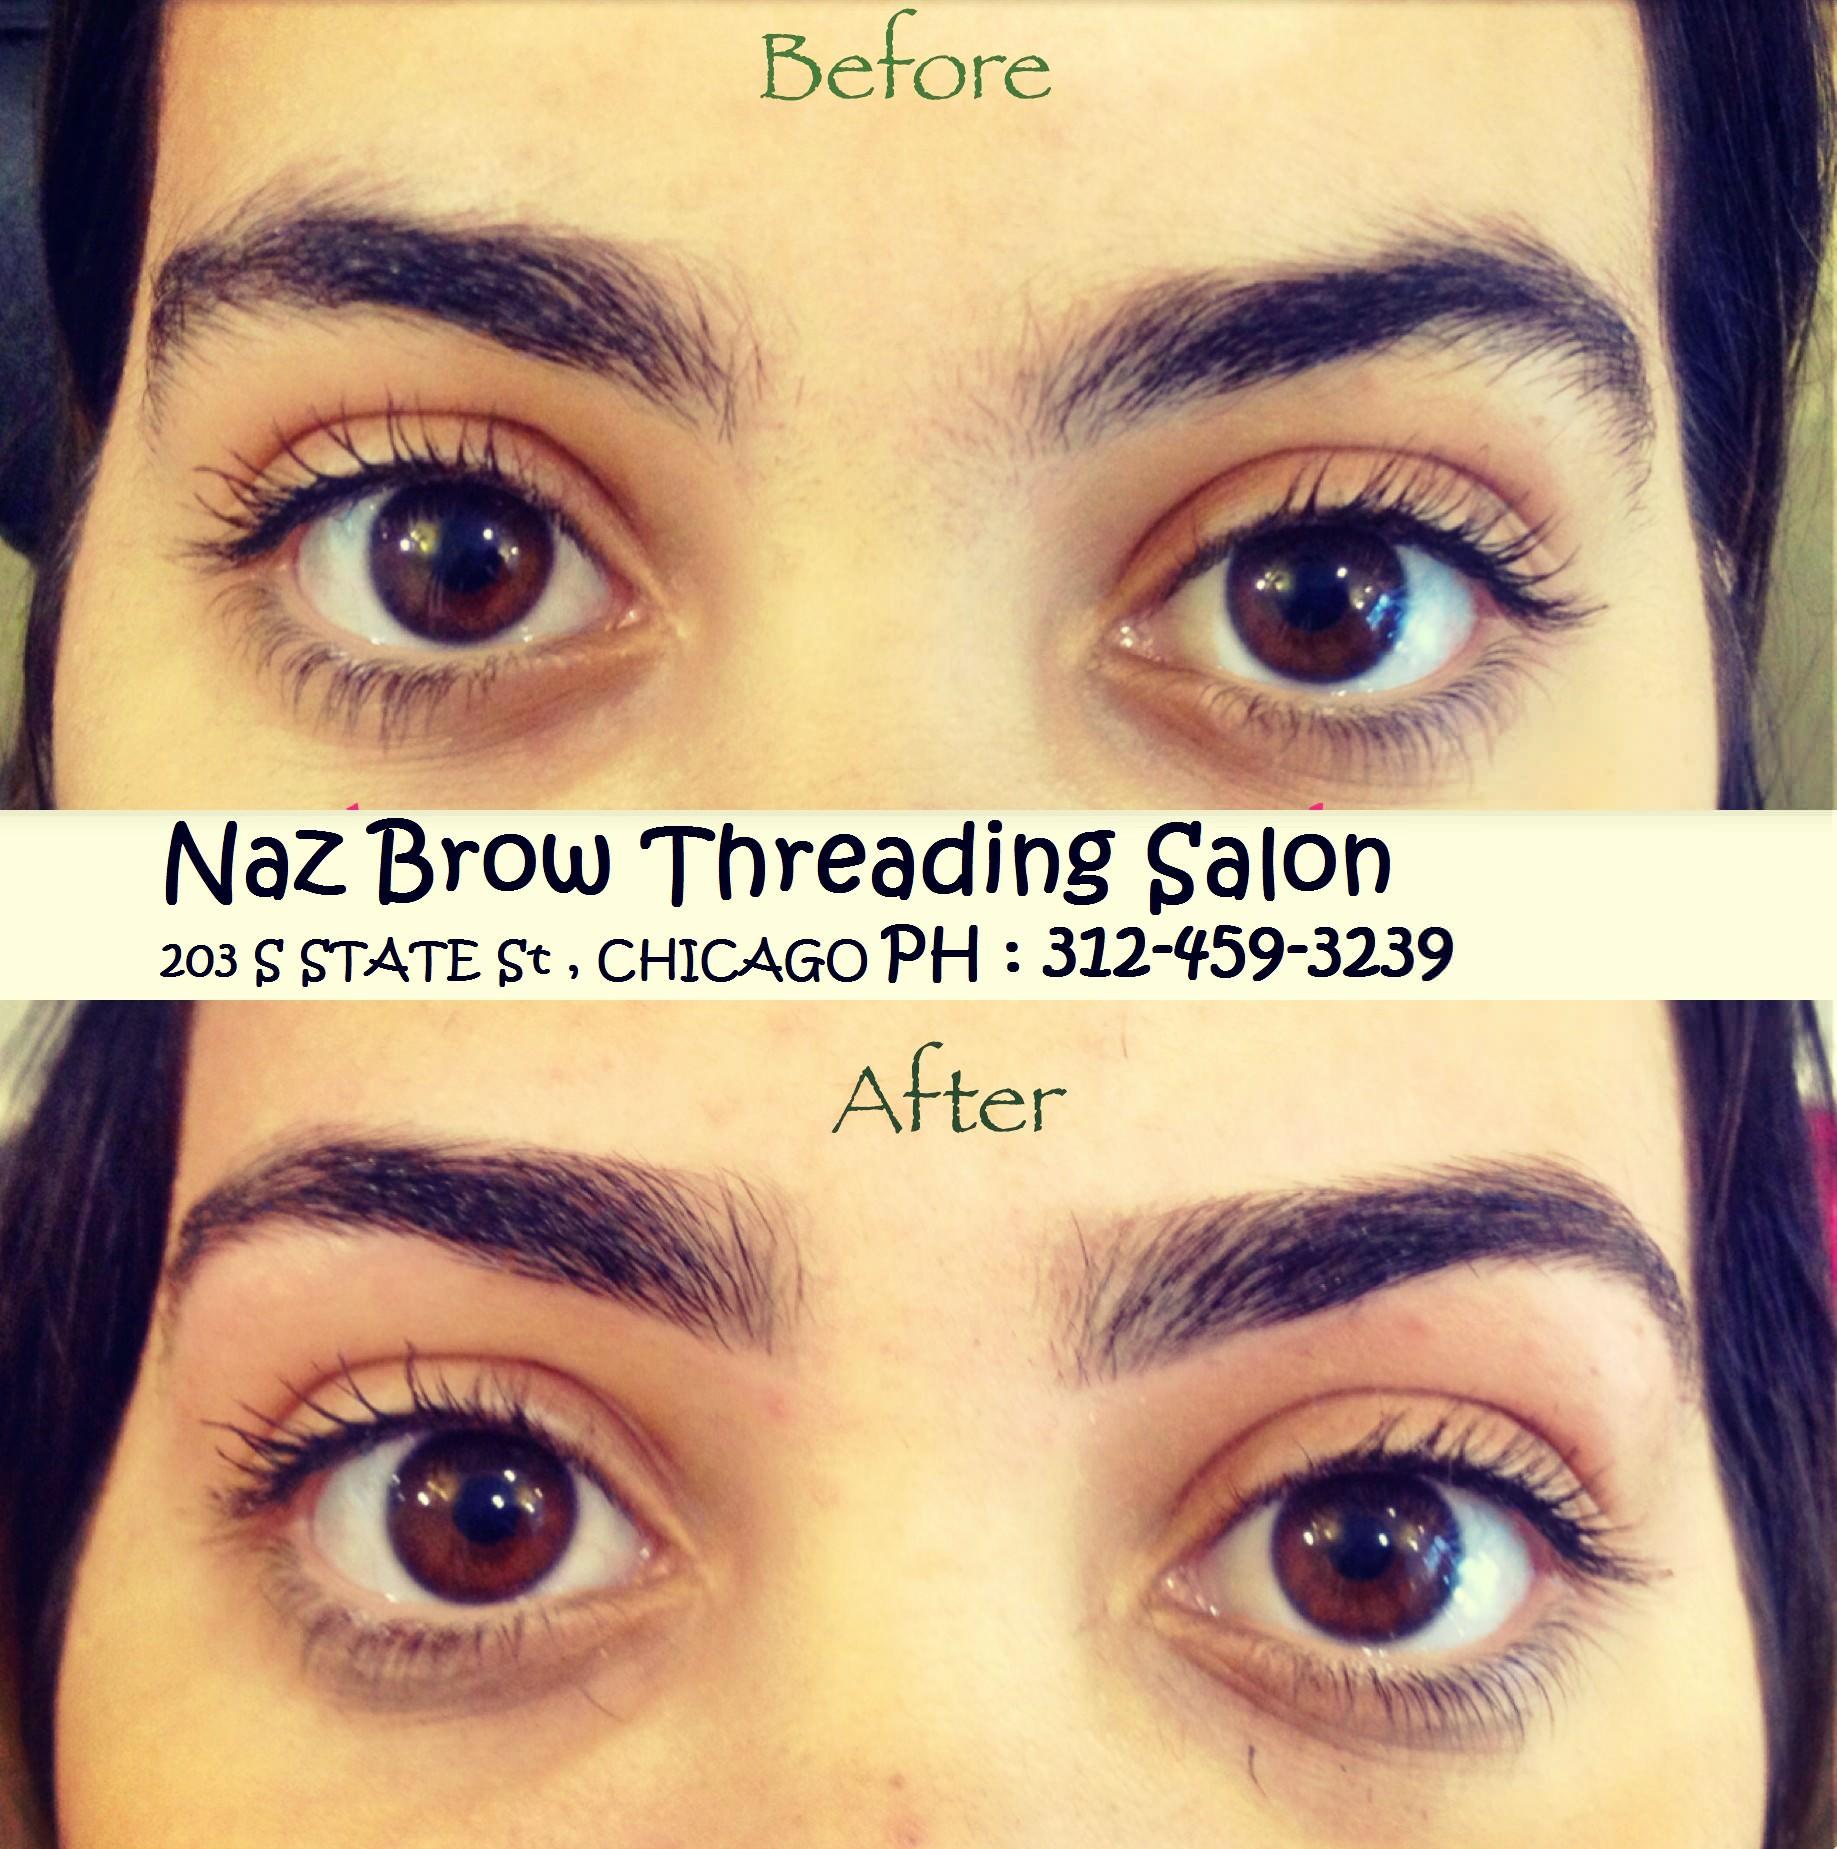 Naz Brow Threading